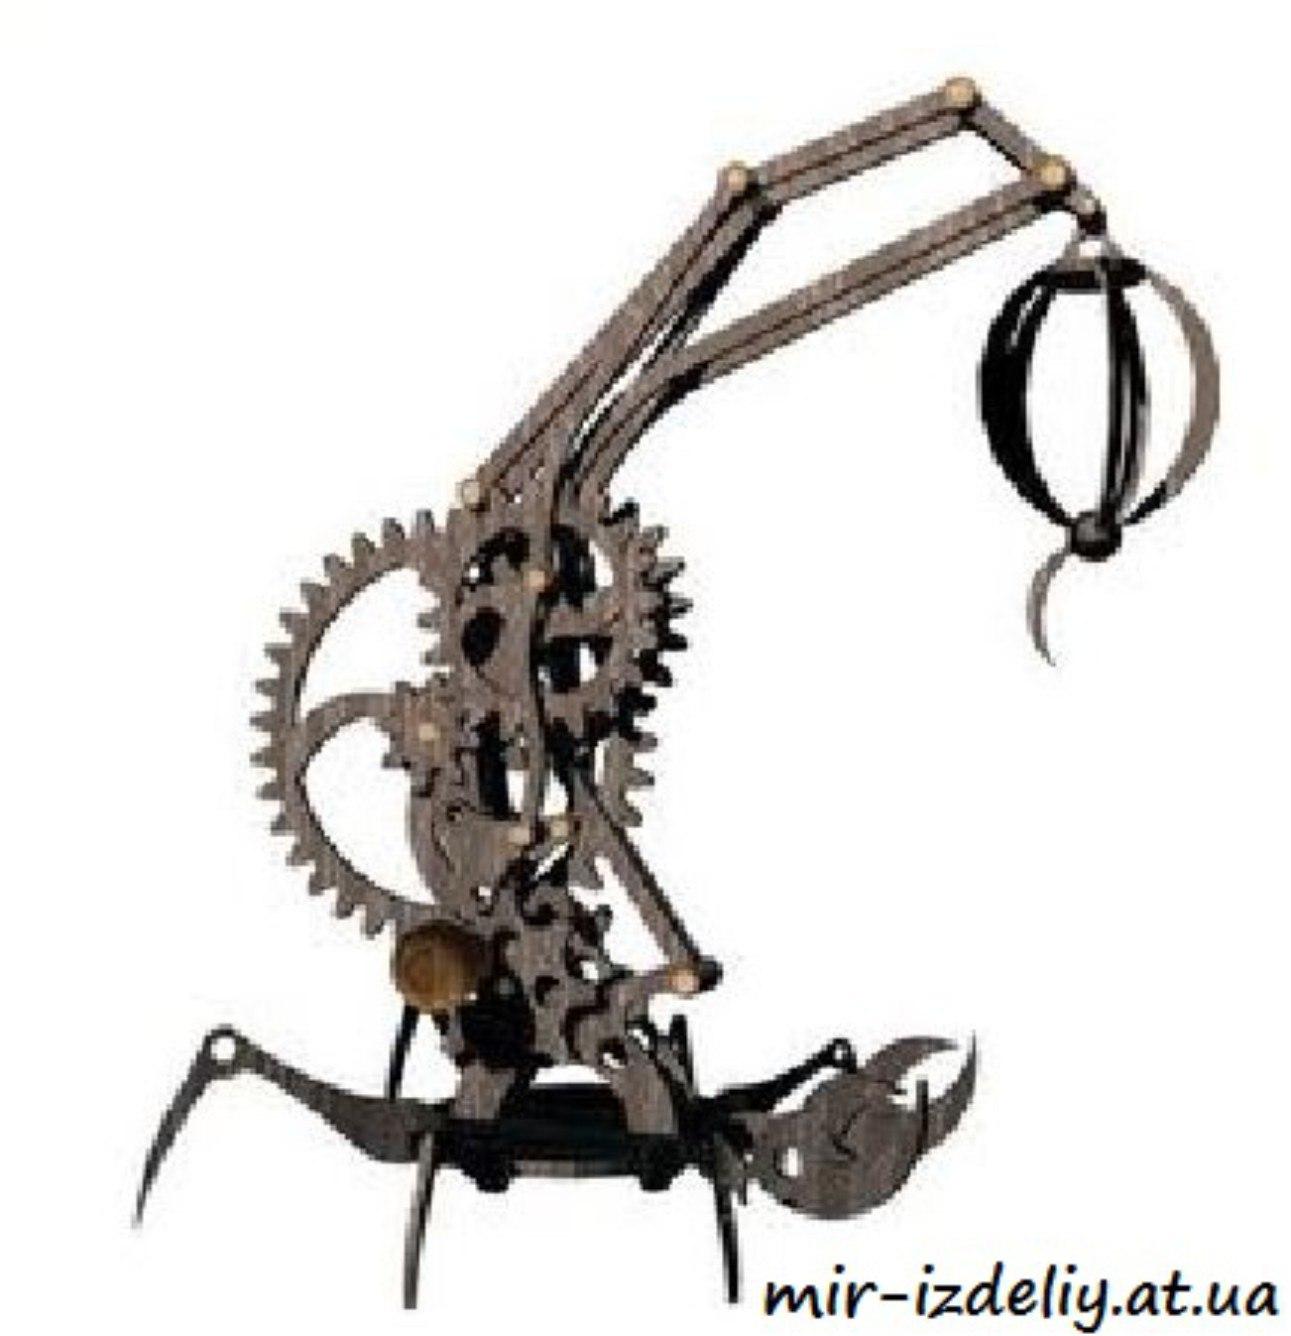 Scorpion Lamp 3D Puzzle Free CDR Vectors Art